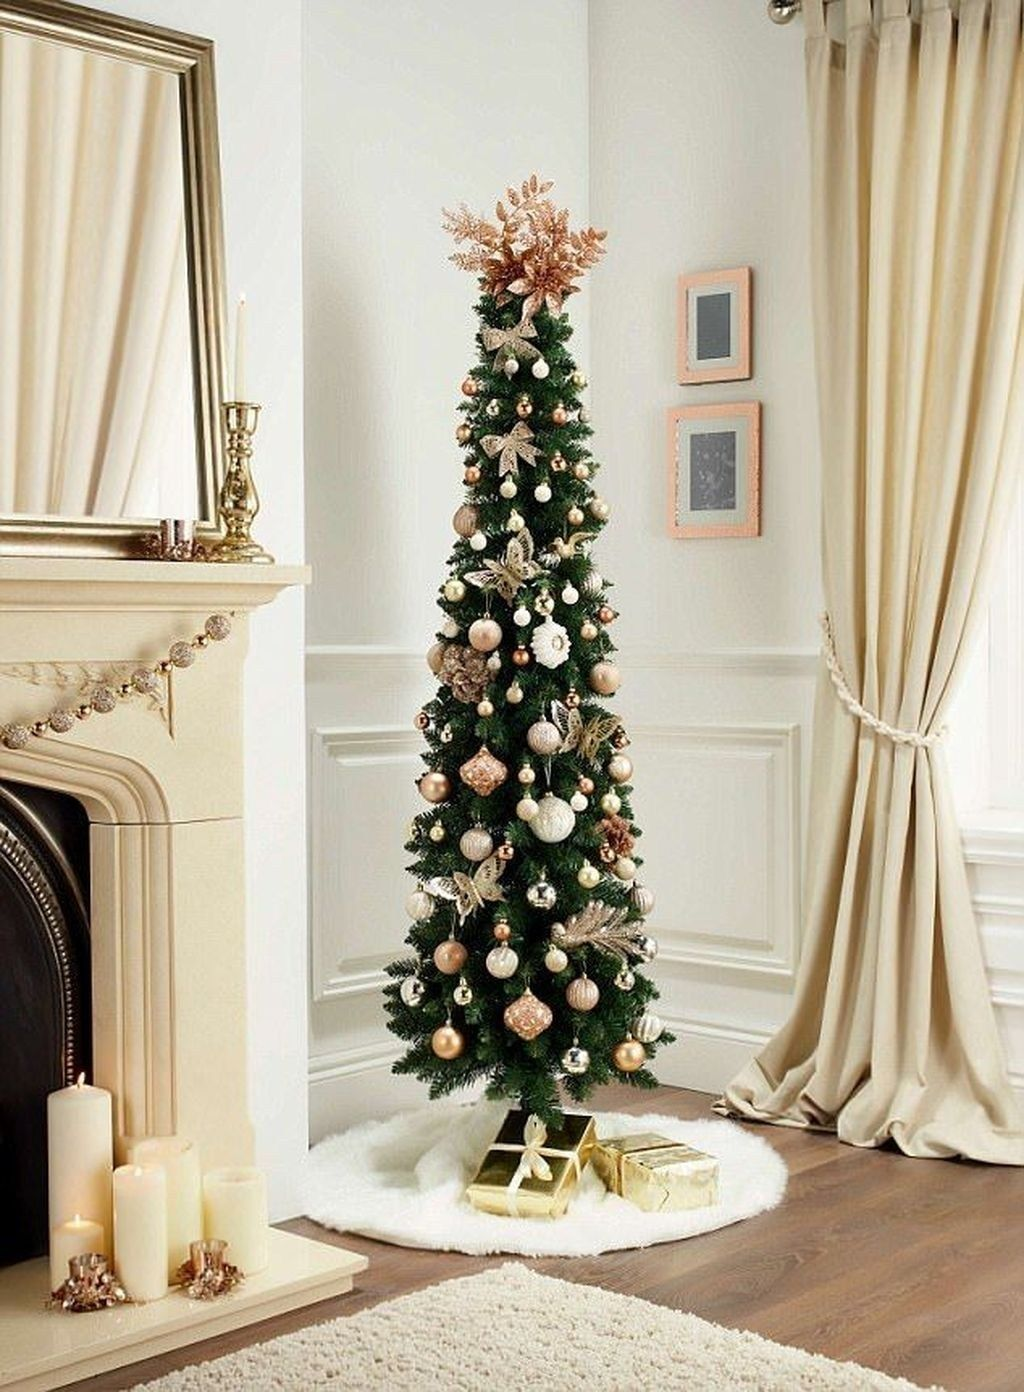 Awesome Pencil Christmas Tree Ideas 19 Christmas Decorations For The Home Christmas Home Pencil Christmas Tree